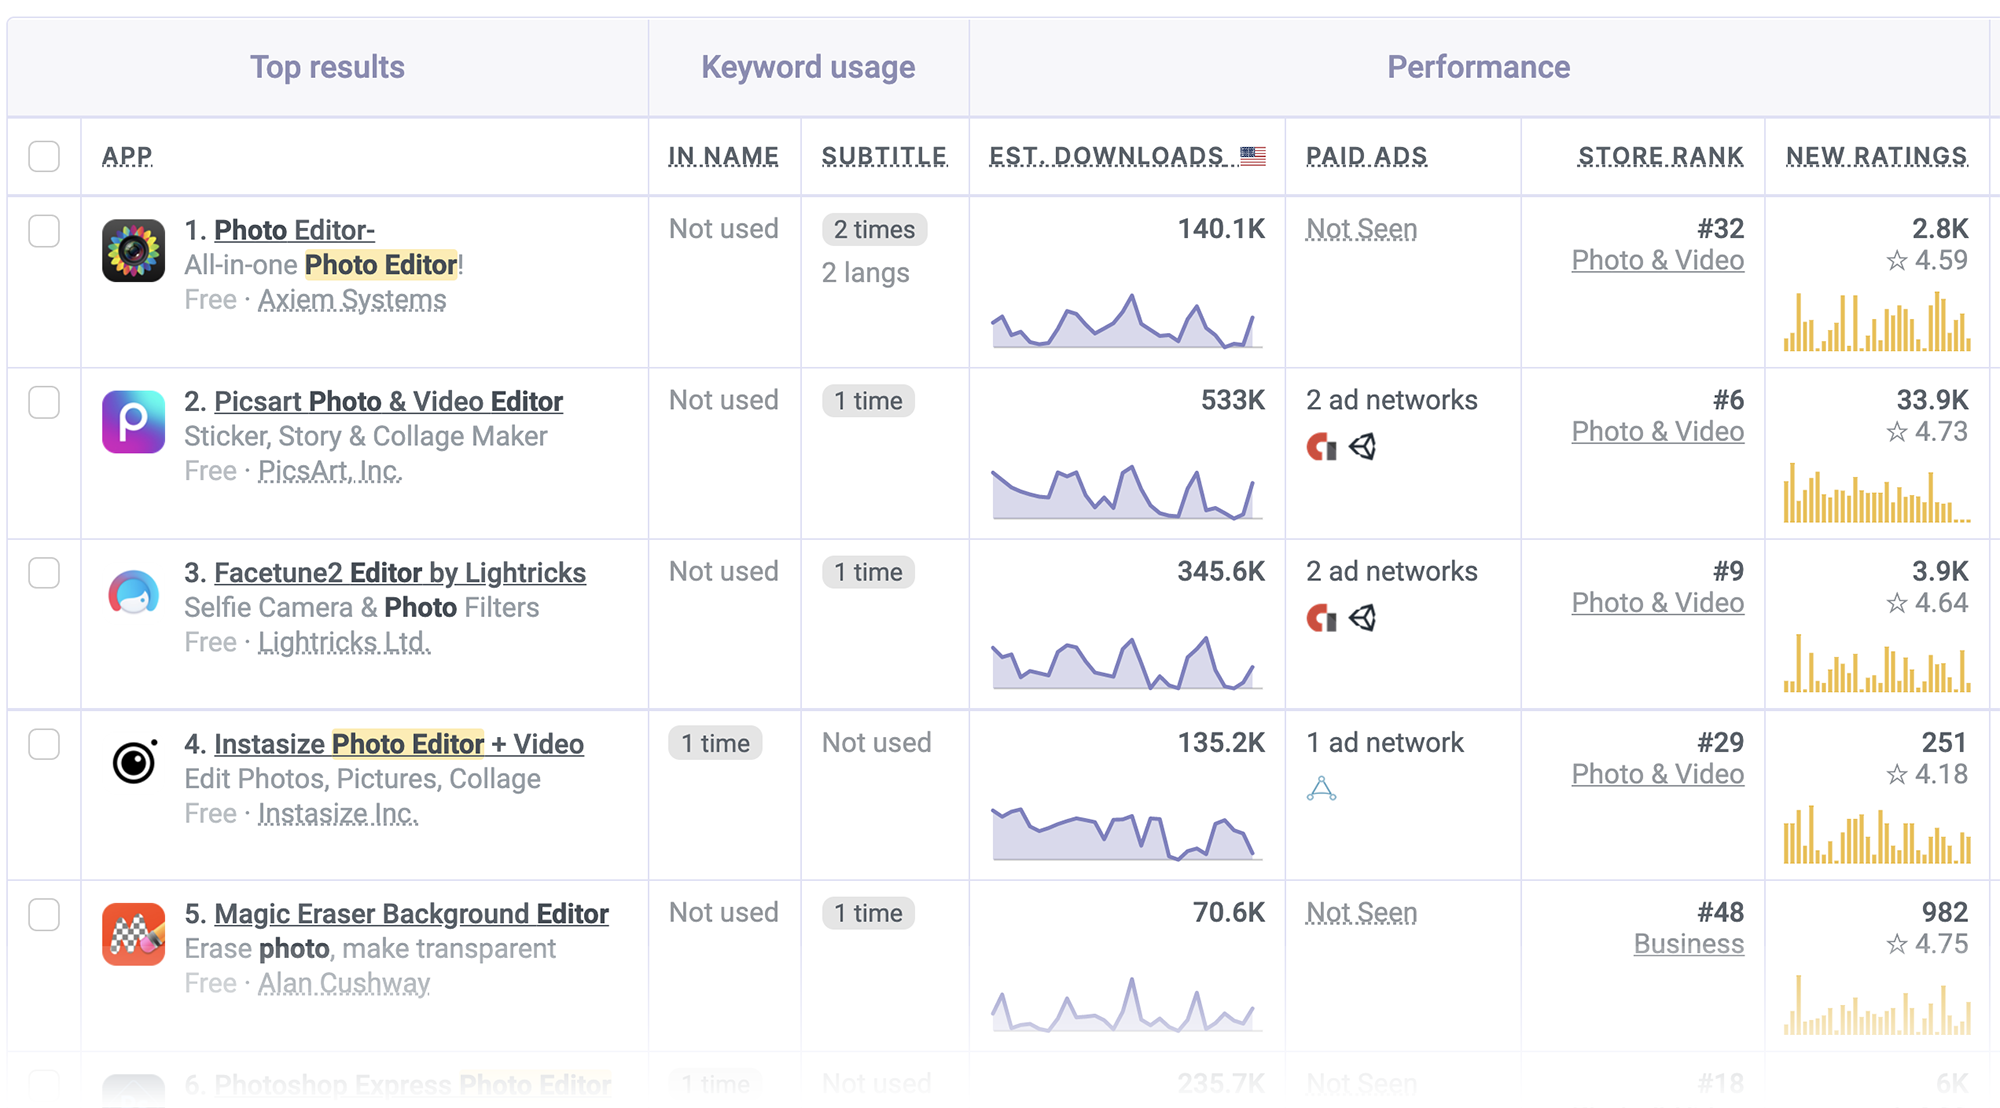 Keyword analysis of photo editors on the App Store